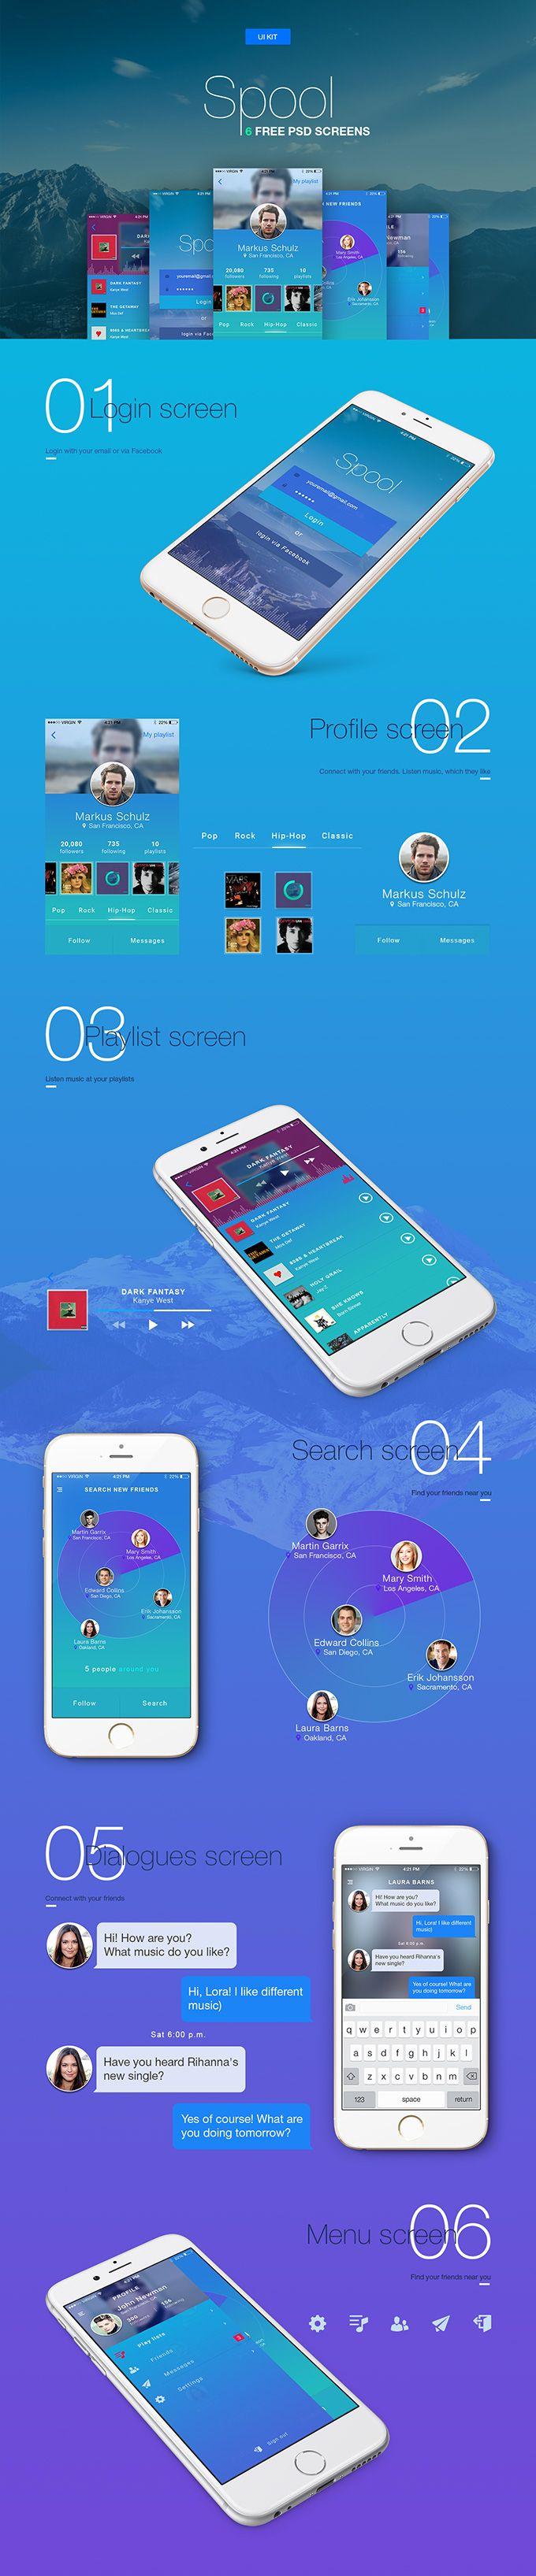 Spool: 6 Mobile UI Templates